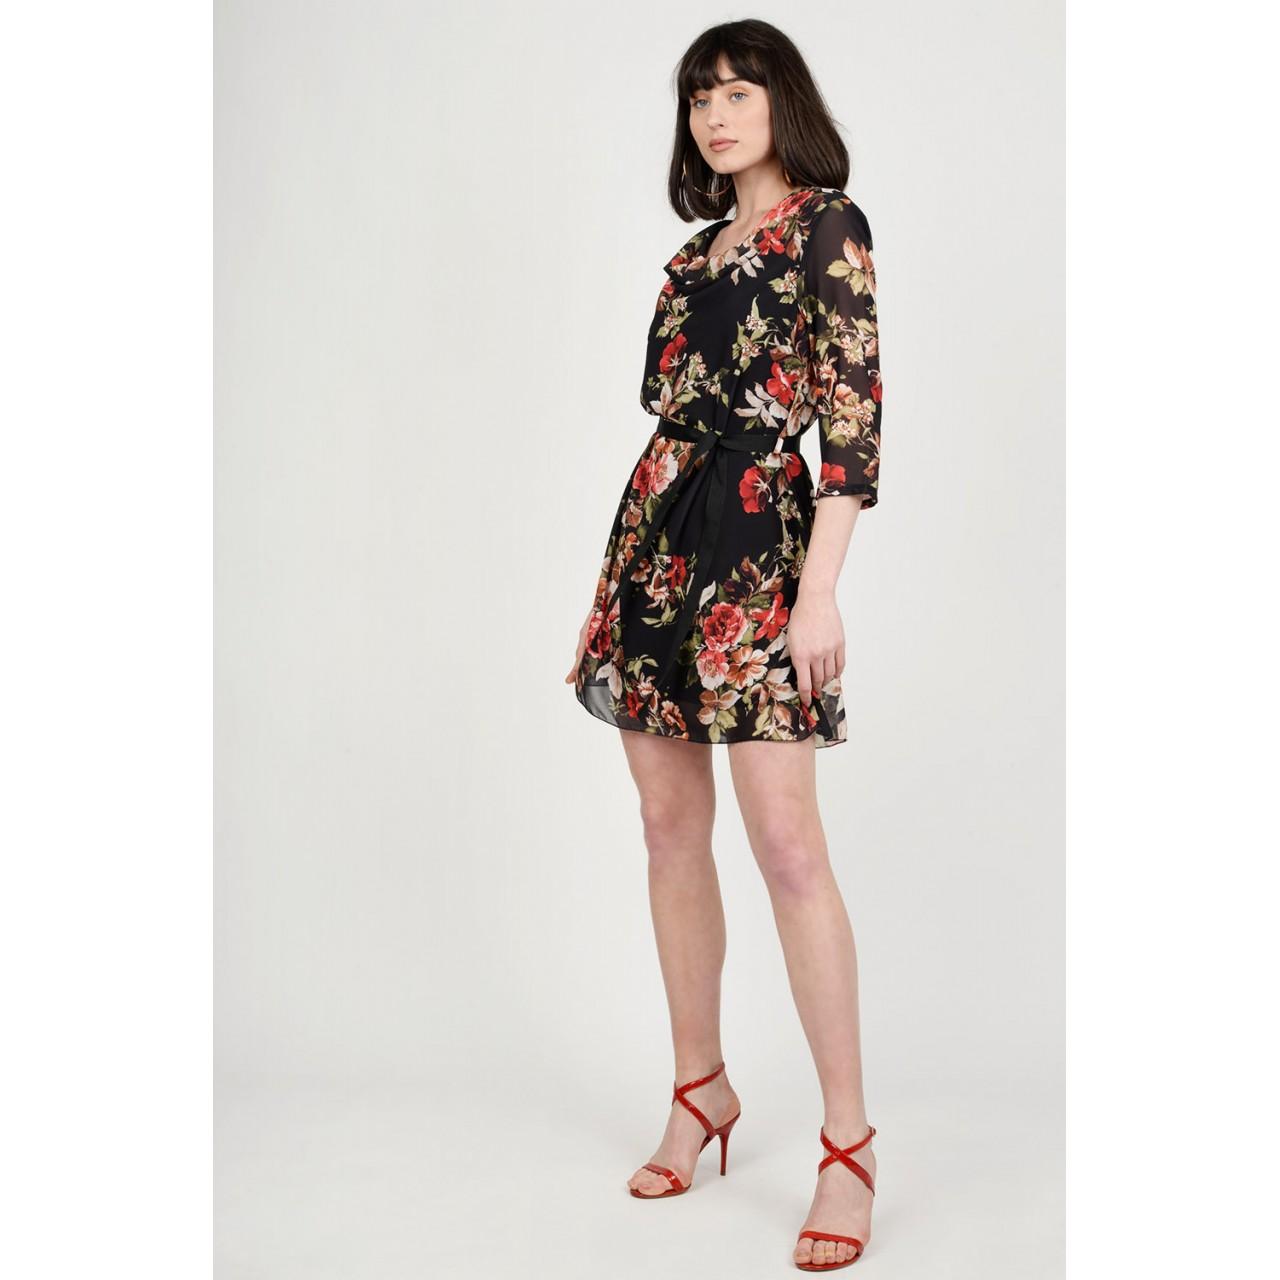 68082689e560 Φόρεμα mini floral